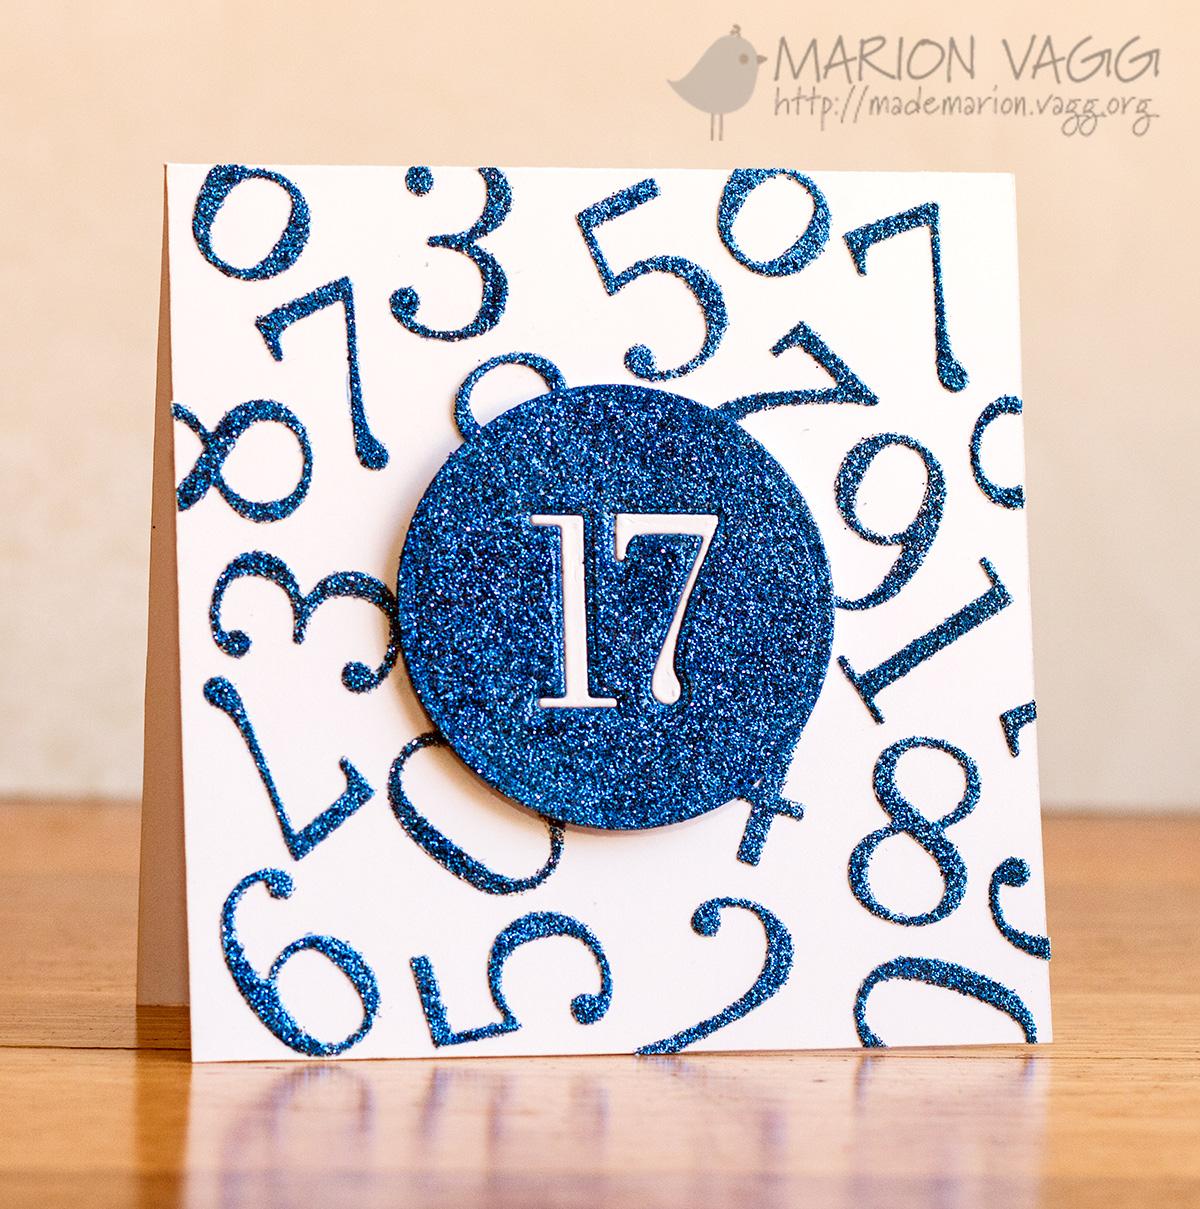 PB 17 | Marion Vagg